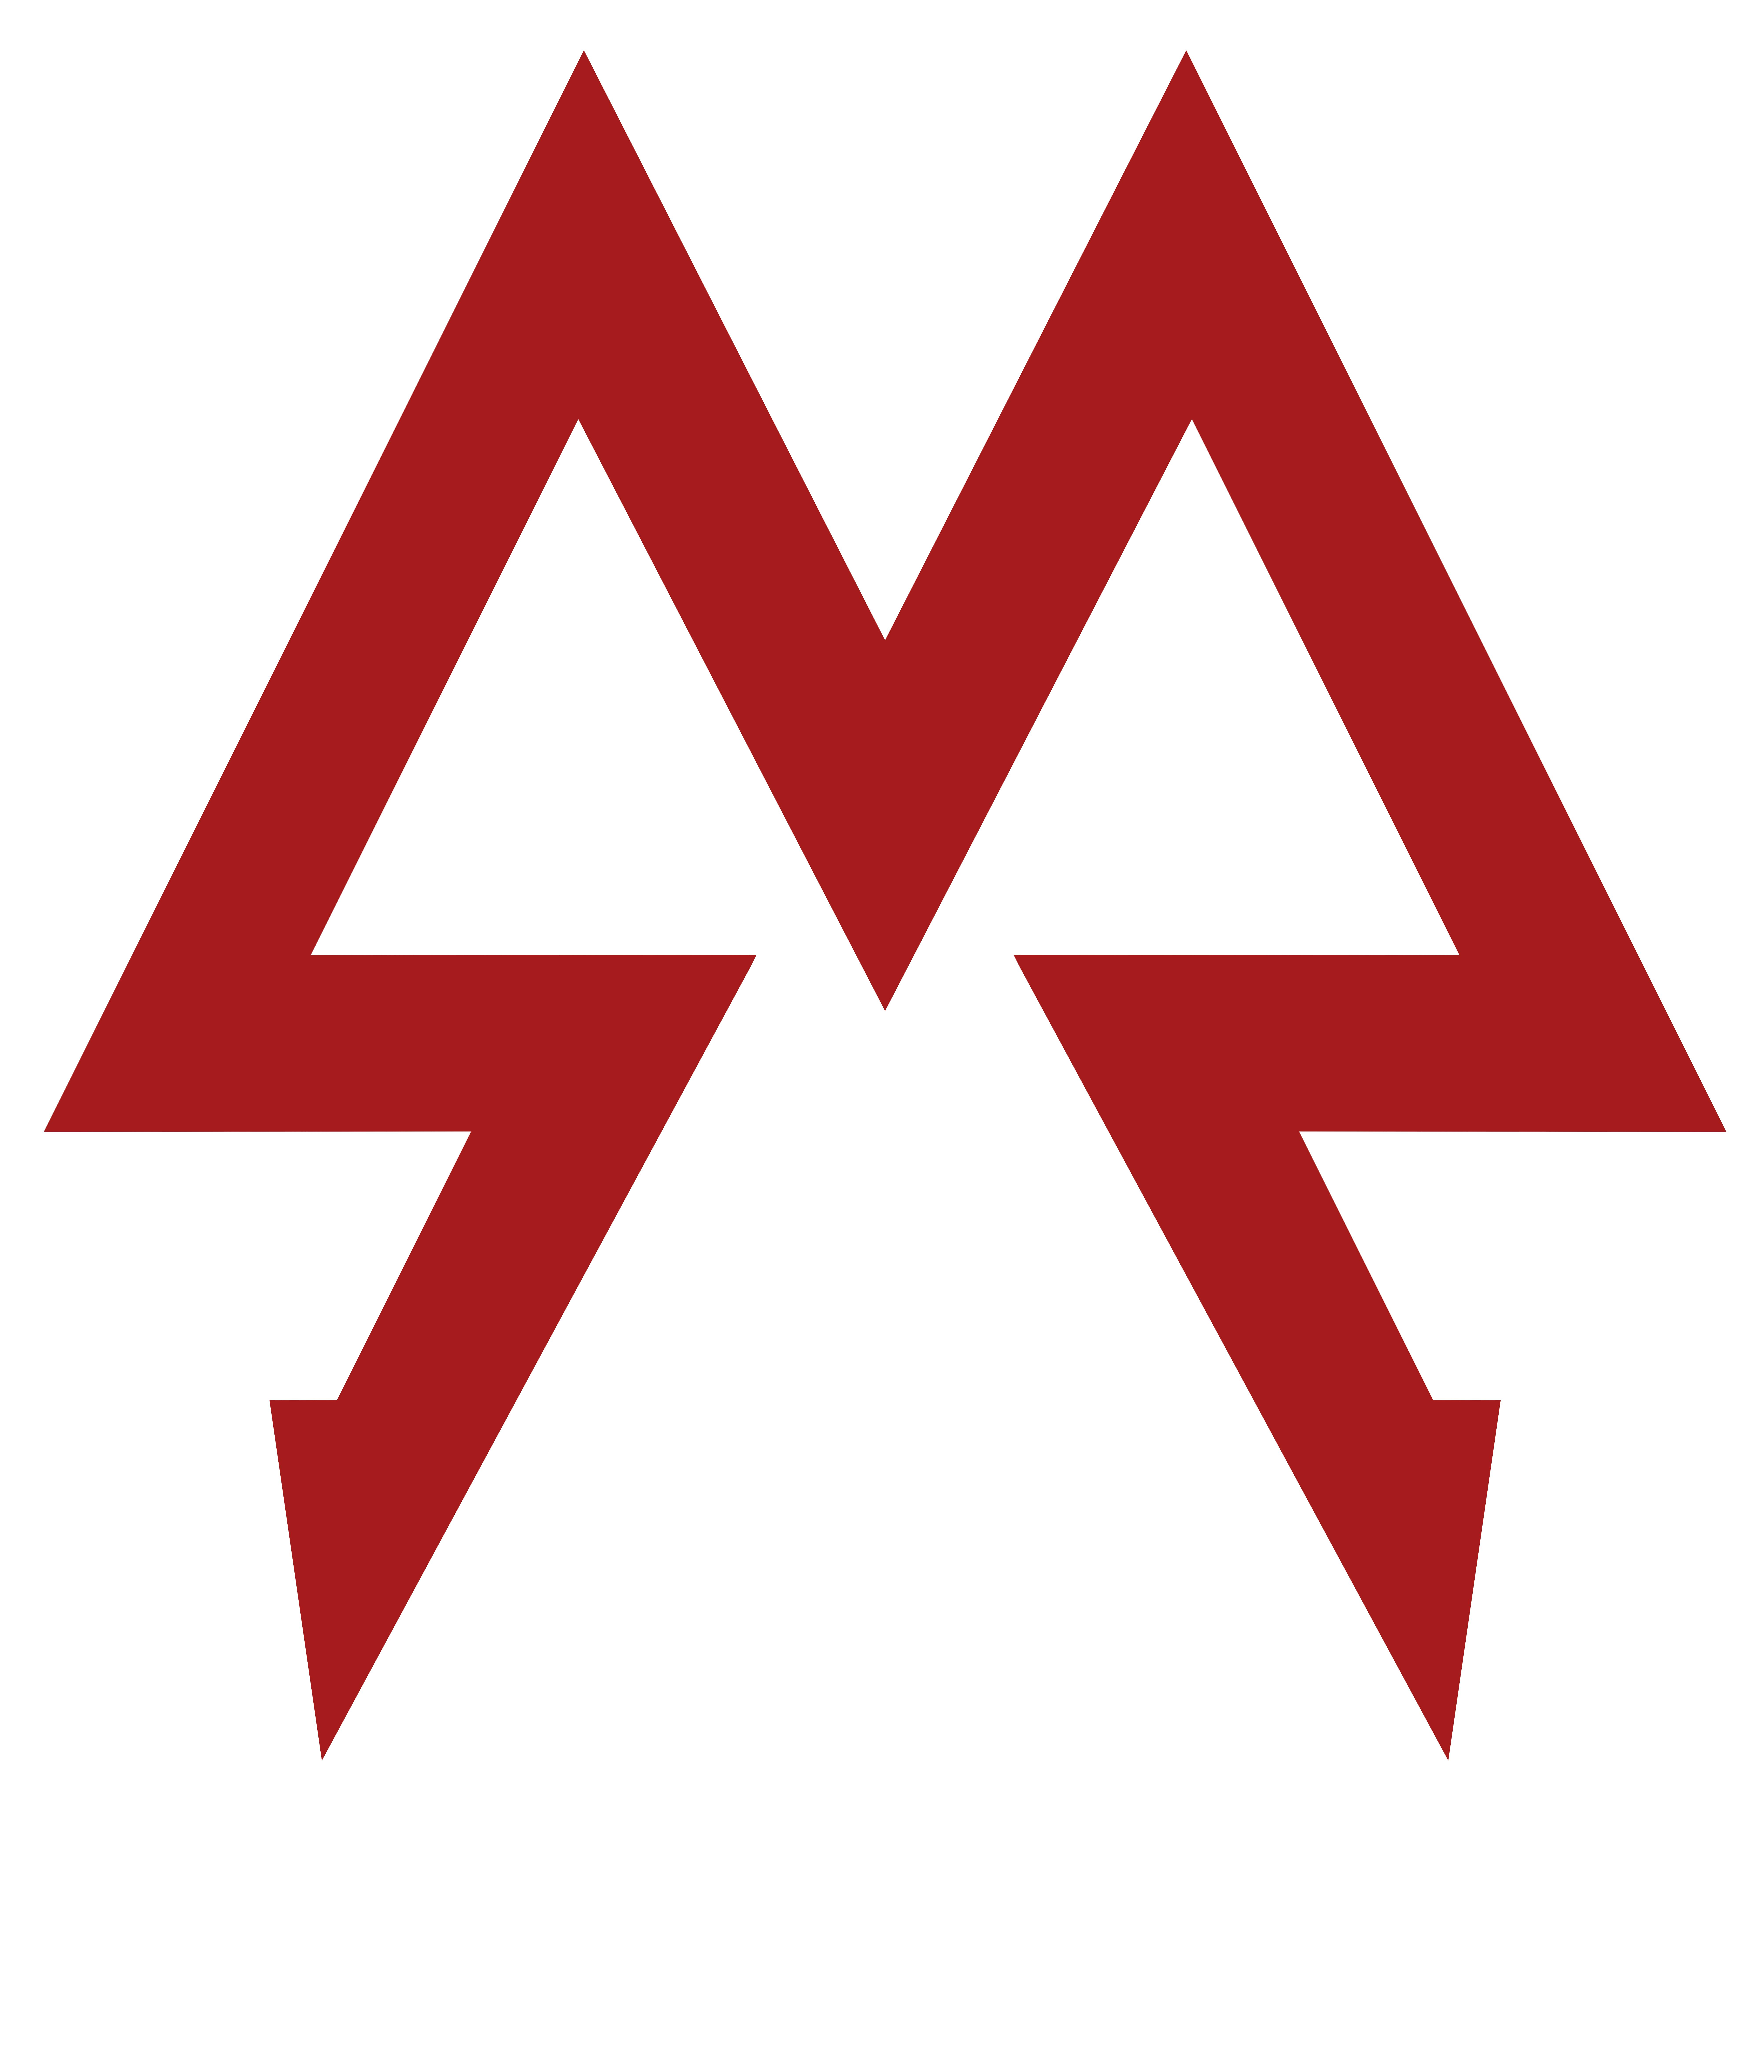 Metro sparta skull uhd logo blank png by namajeff5000 on deviantart - Hd wallpapers 10000x10000 ...